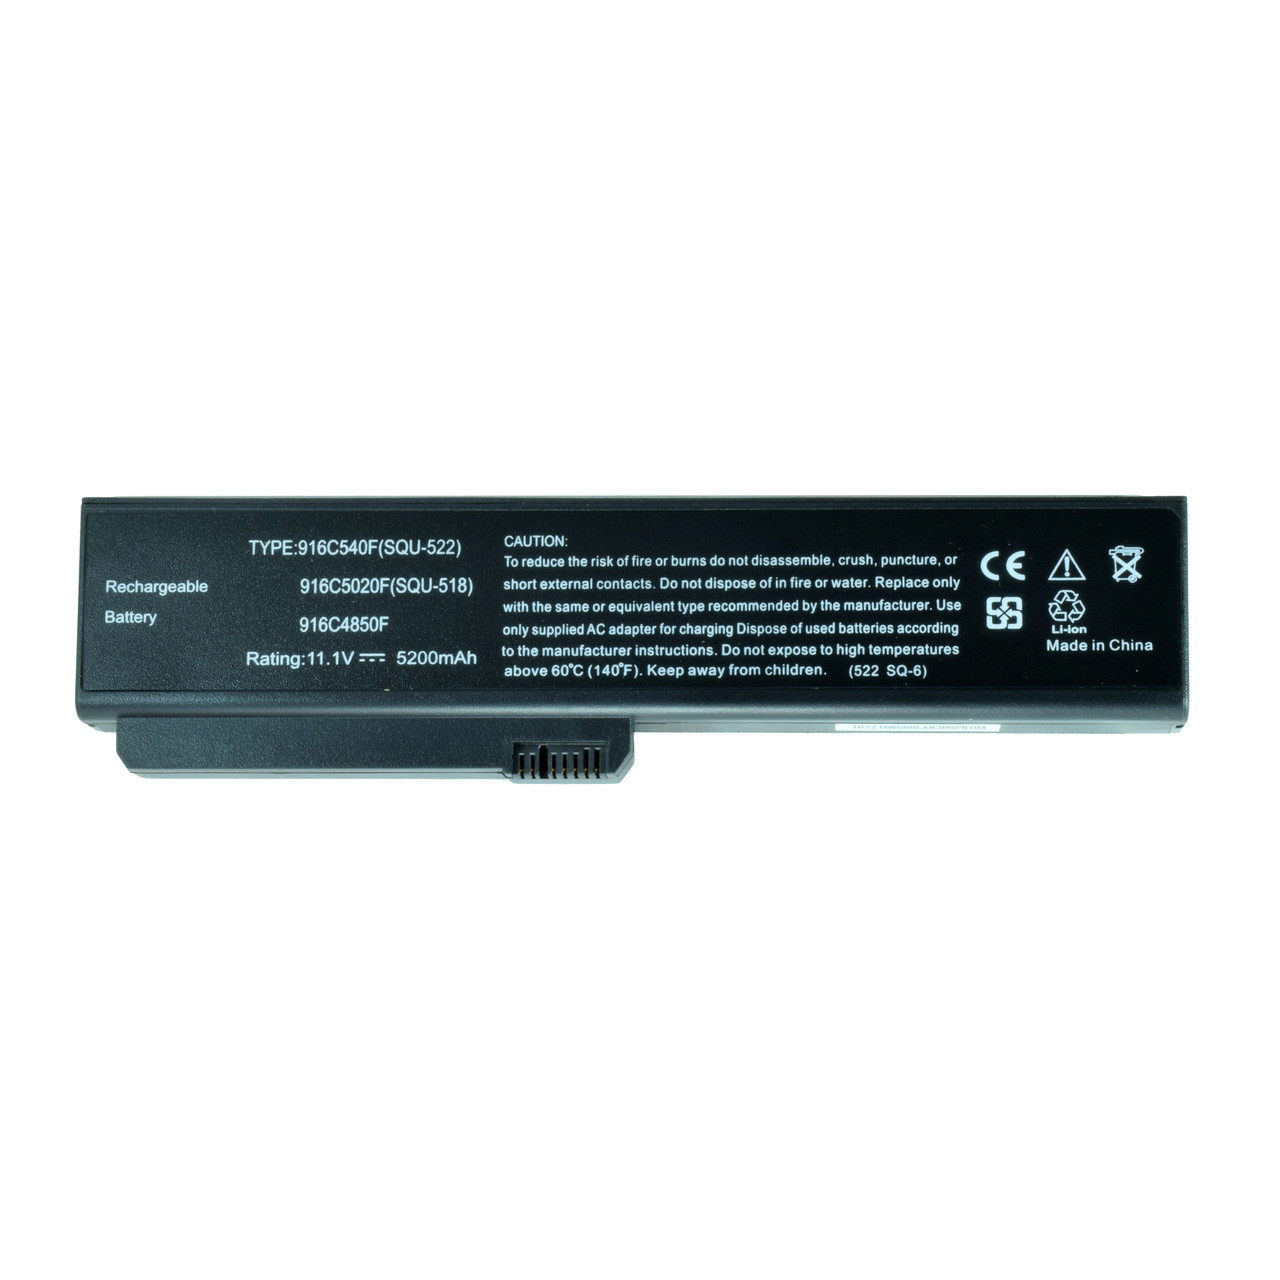 Батарея для ноутбука FUJITSU SQU-518 SQU-522 3UR18650F-2-Q 3UR18650F-2-QC-12 3UR18650F-2-QC12W